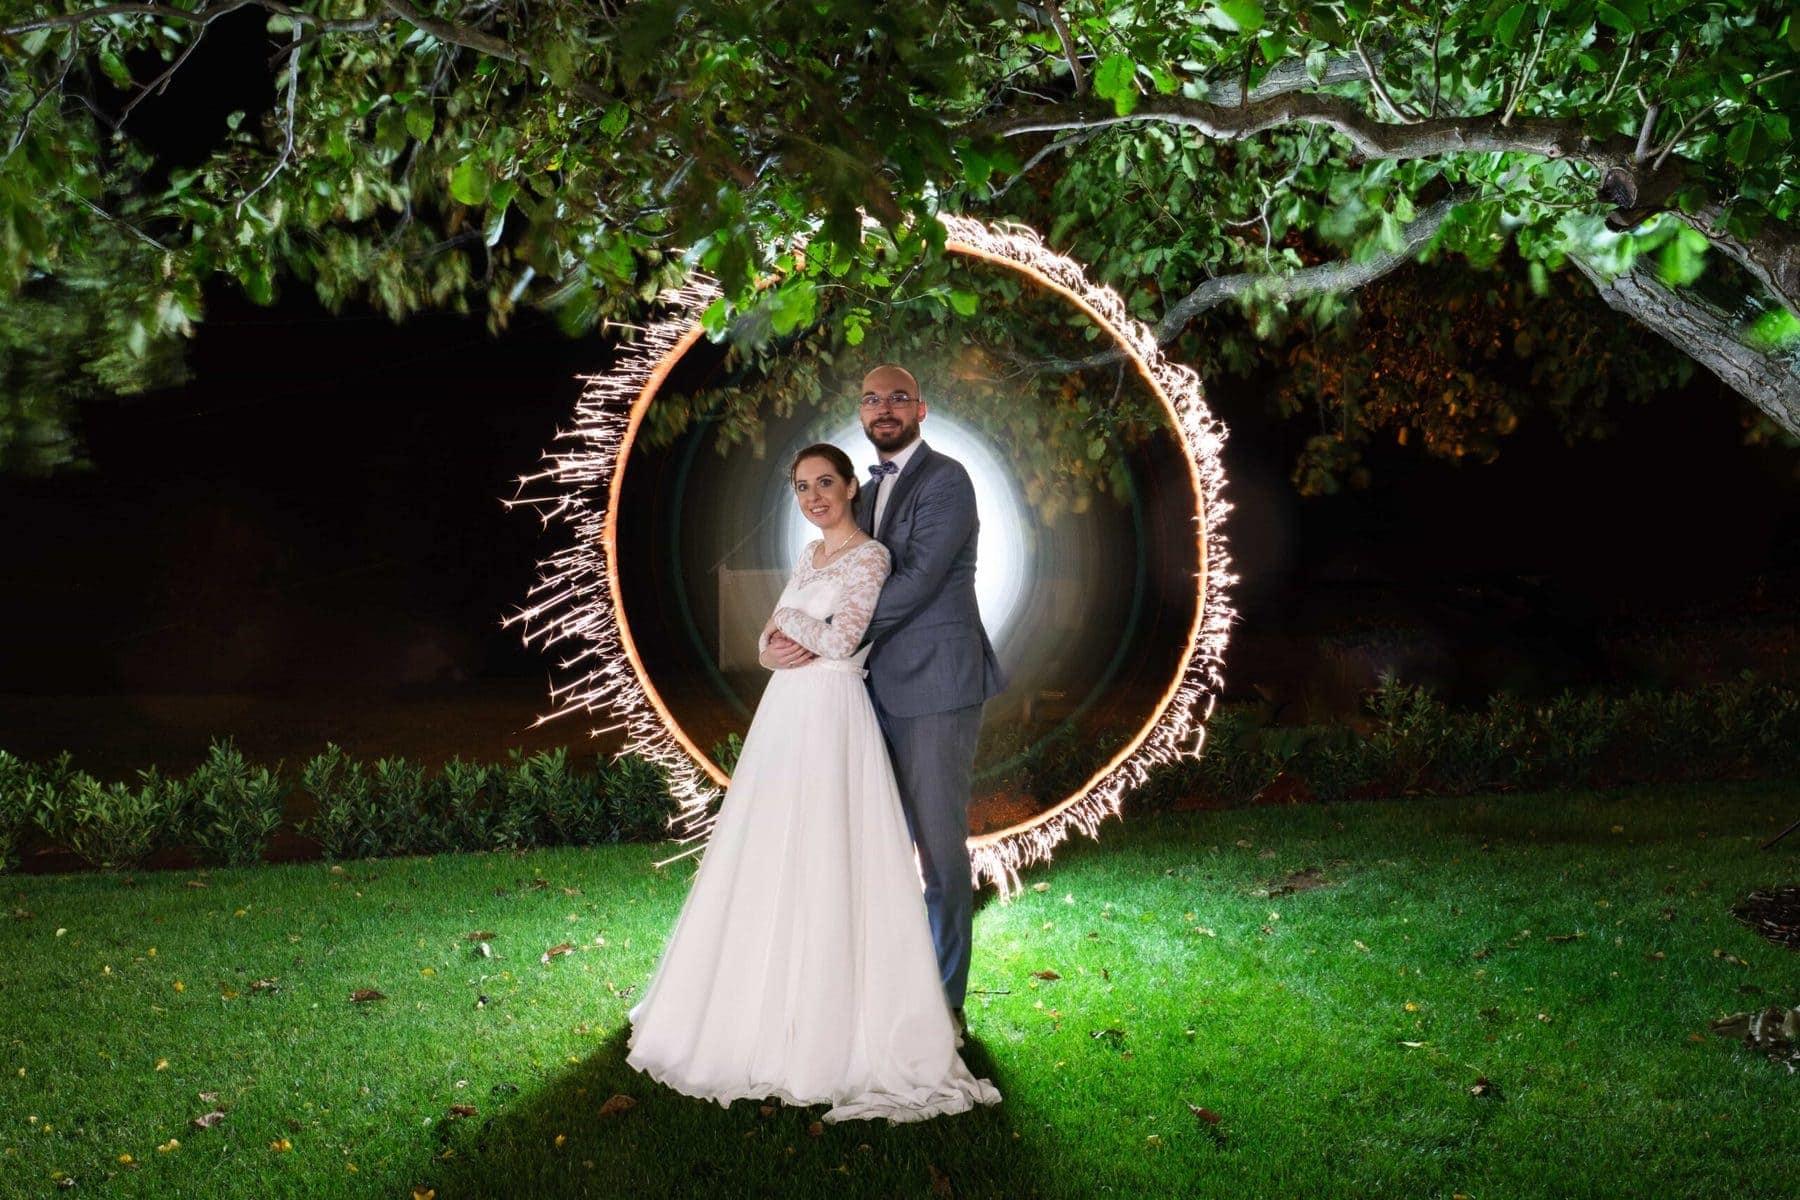 Special Moments Light mit Brautpaar am Abend